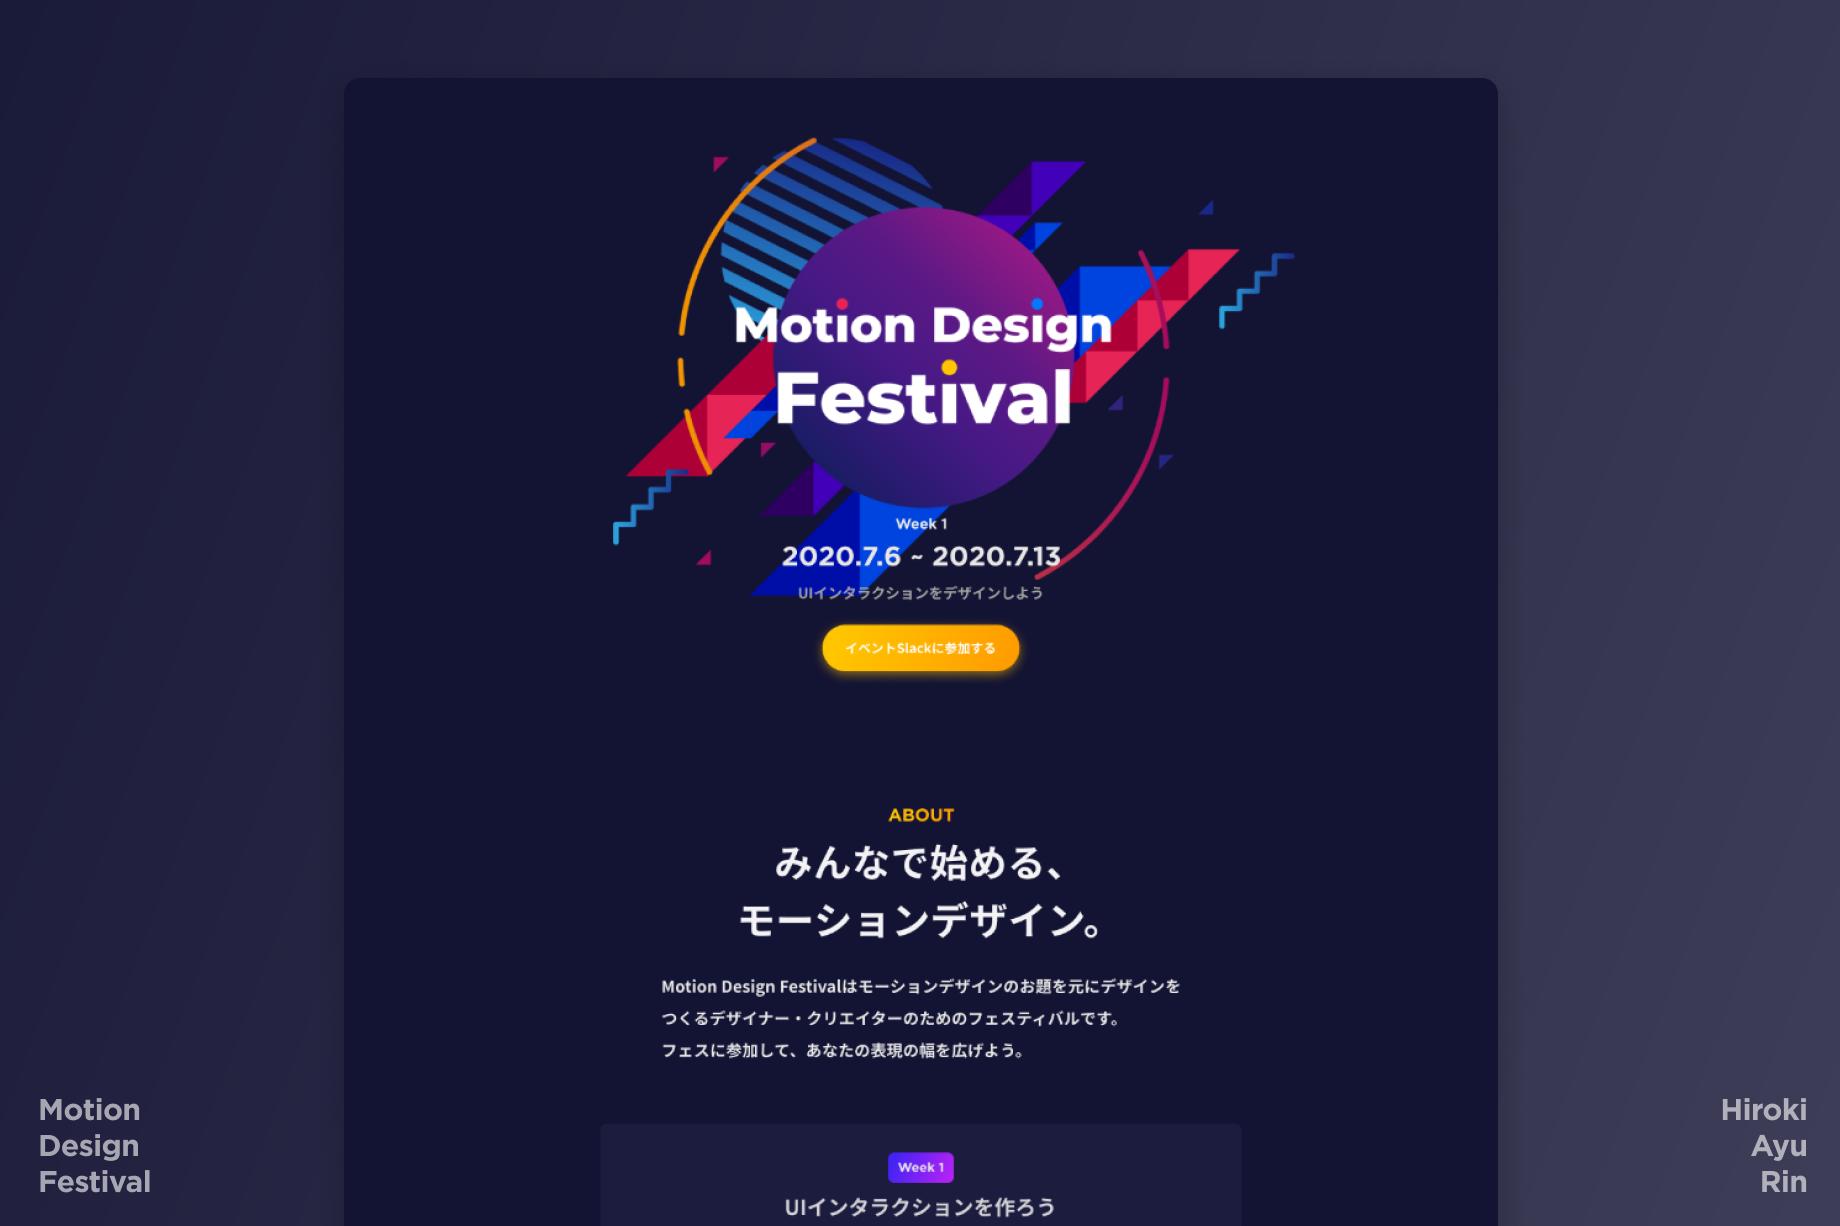 Motion Design Festival LPデザインのサムネイル画像